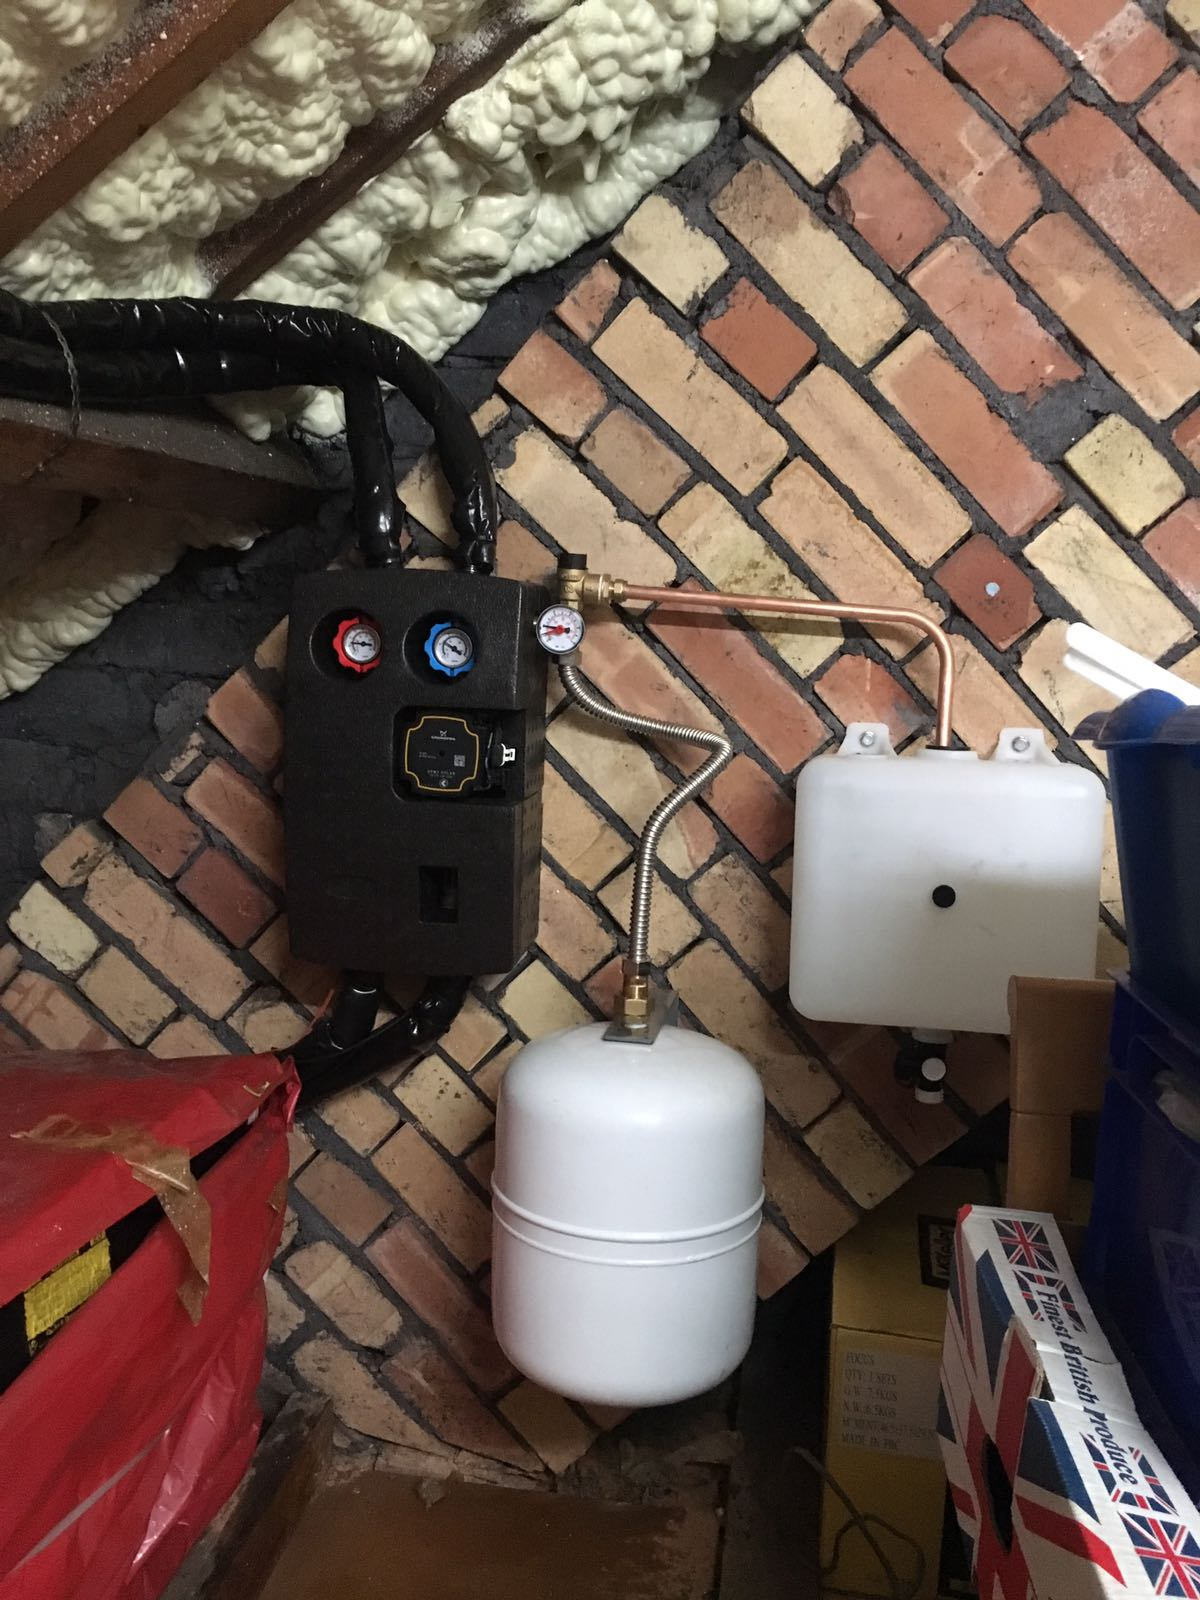 Thermal Pump Station